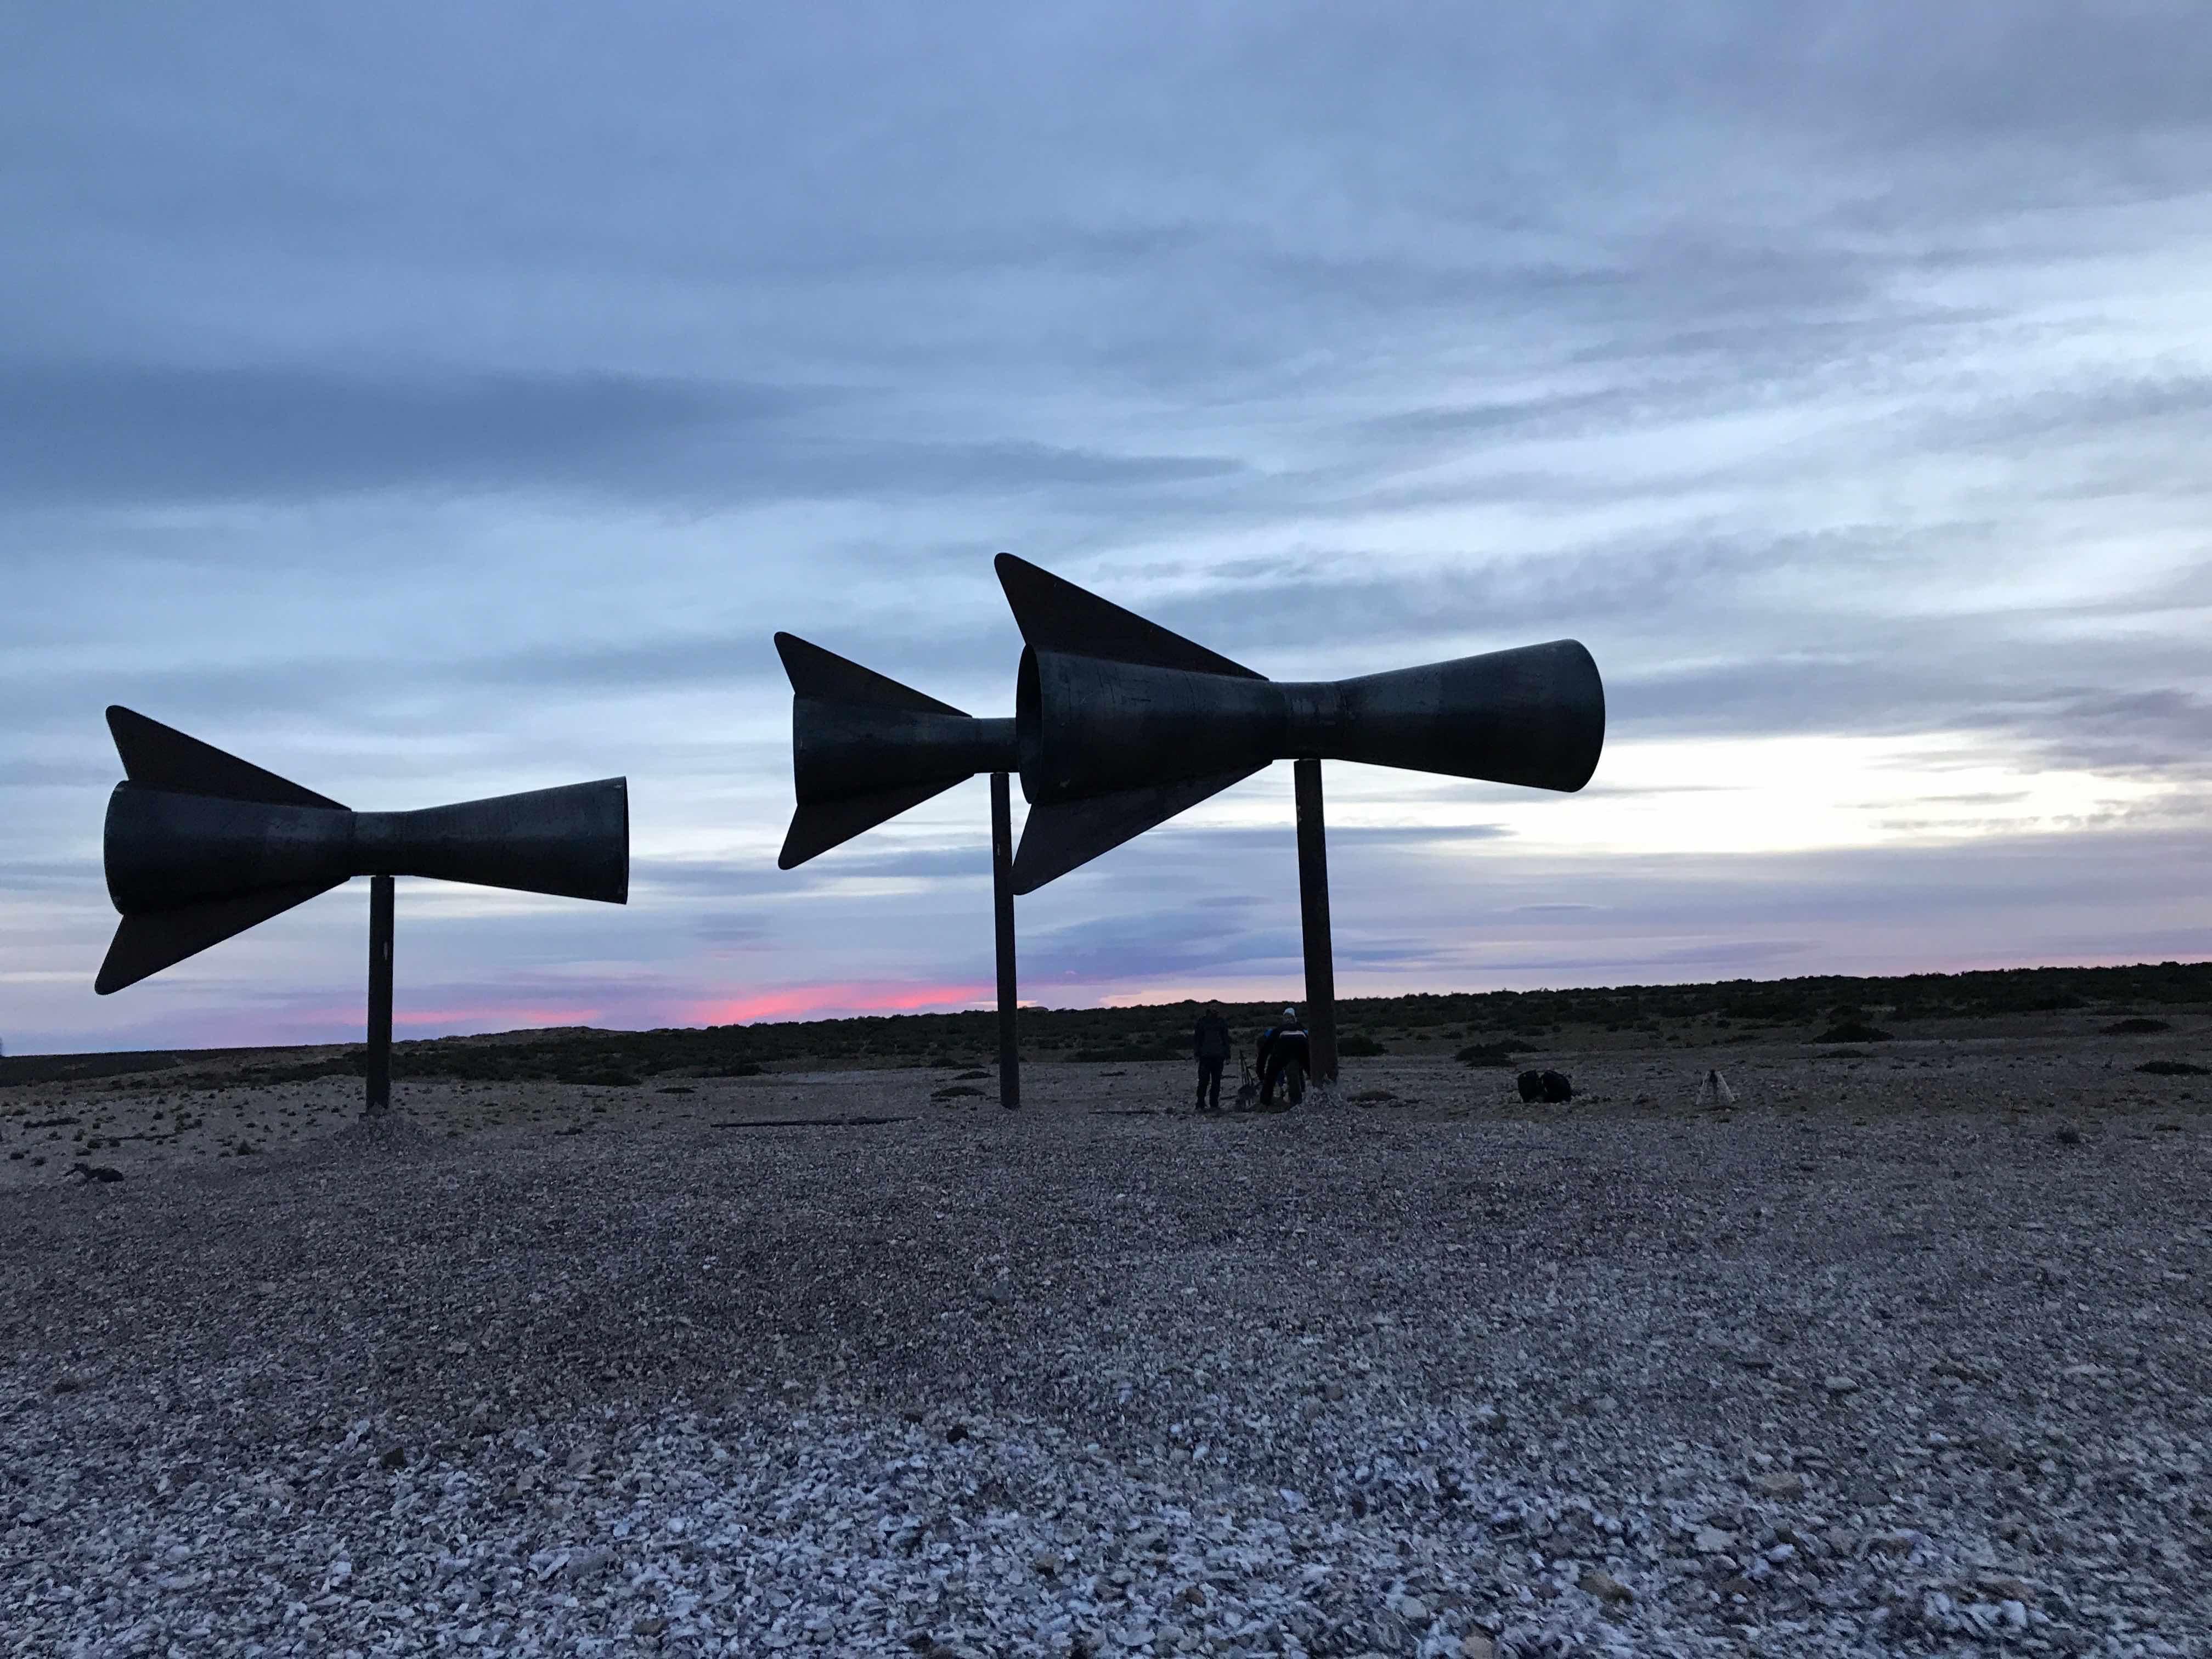 Misterios, 2017 Site-specific installation, Patagonia